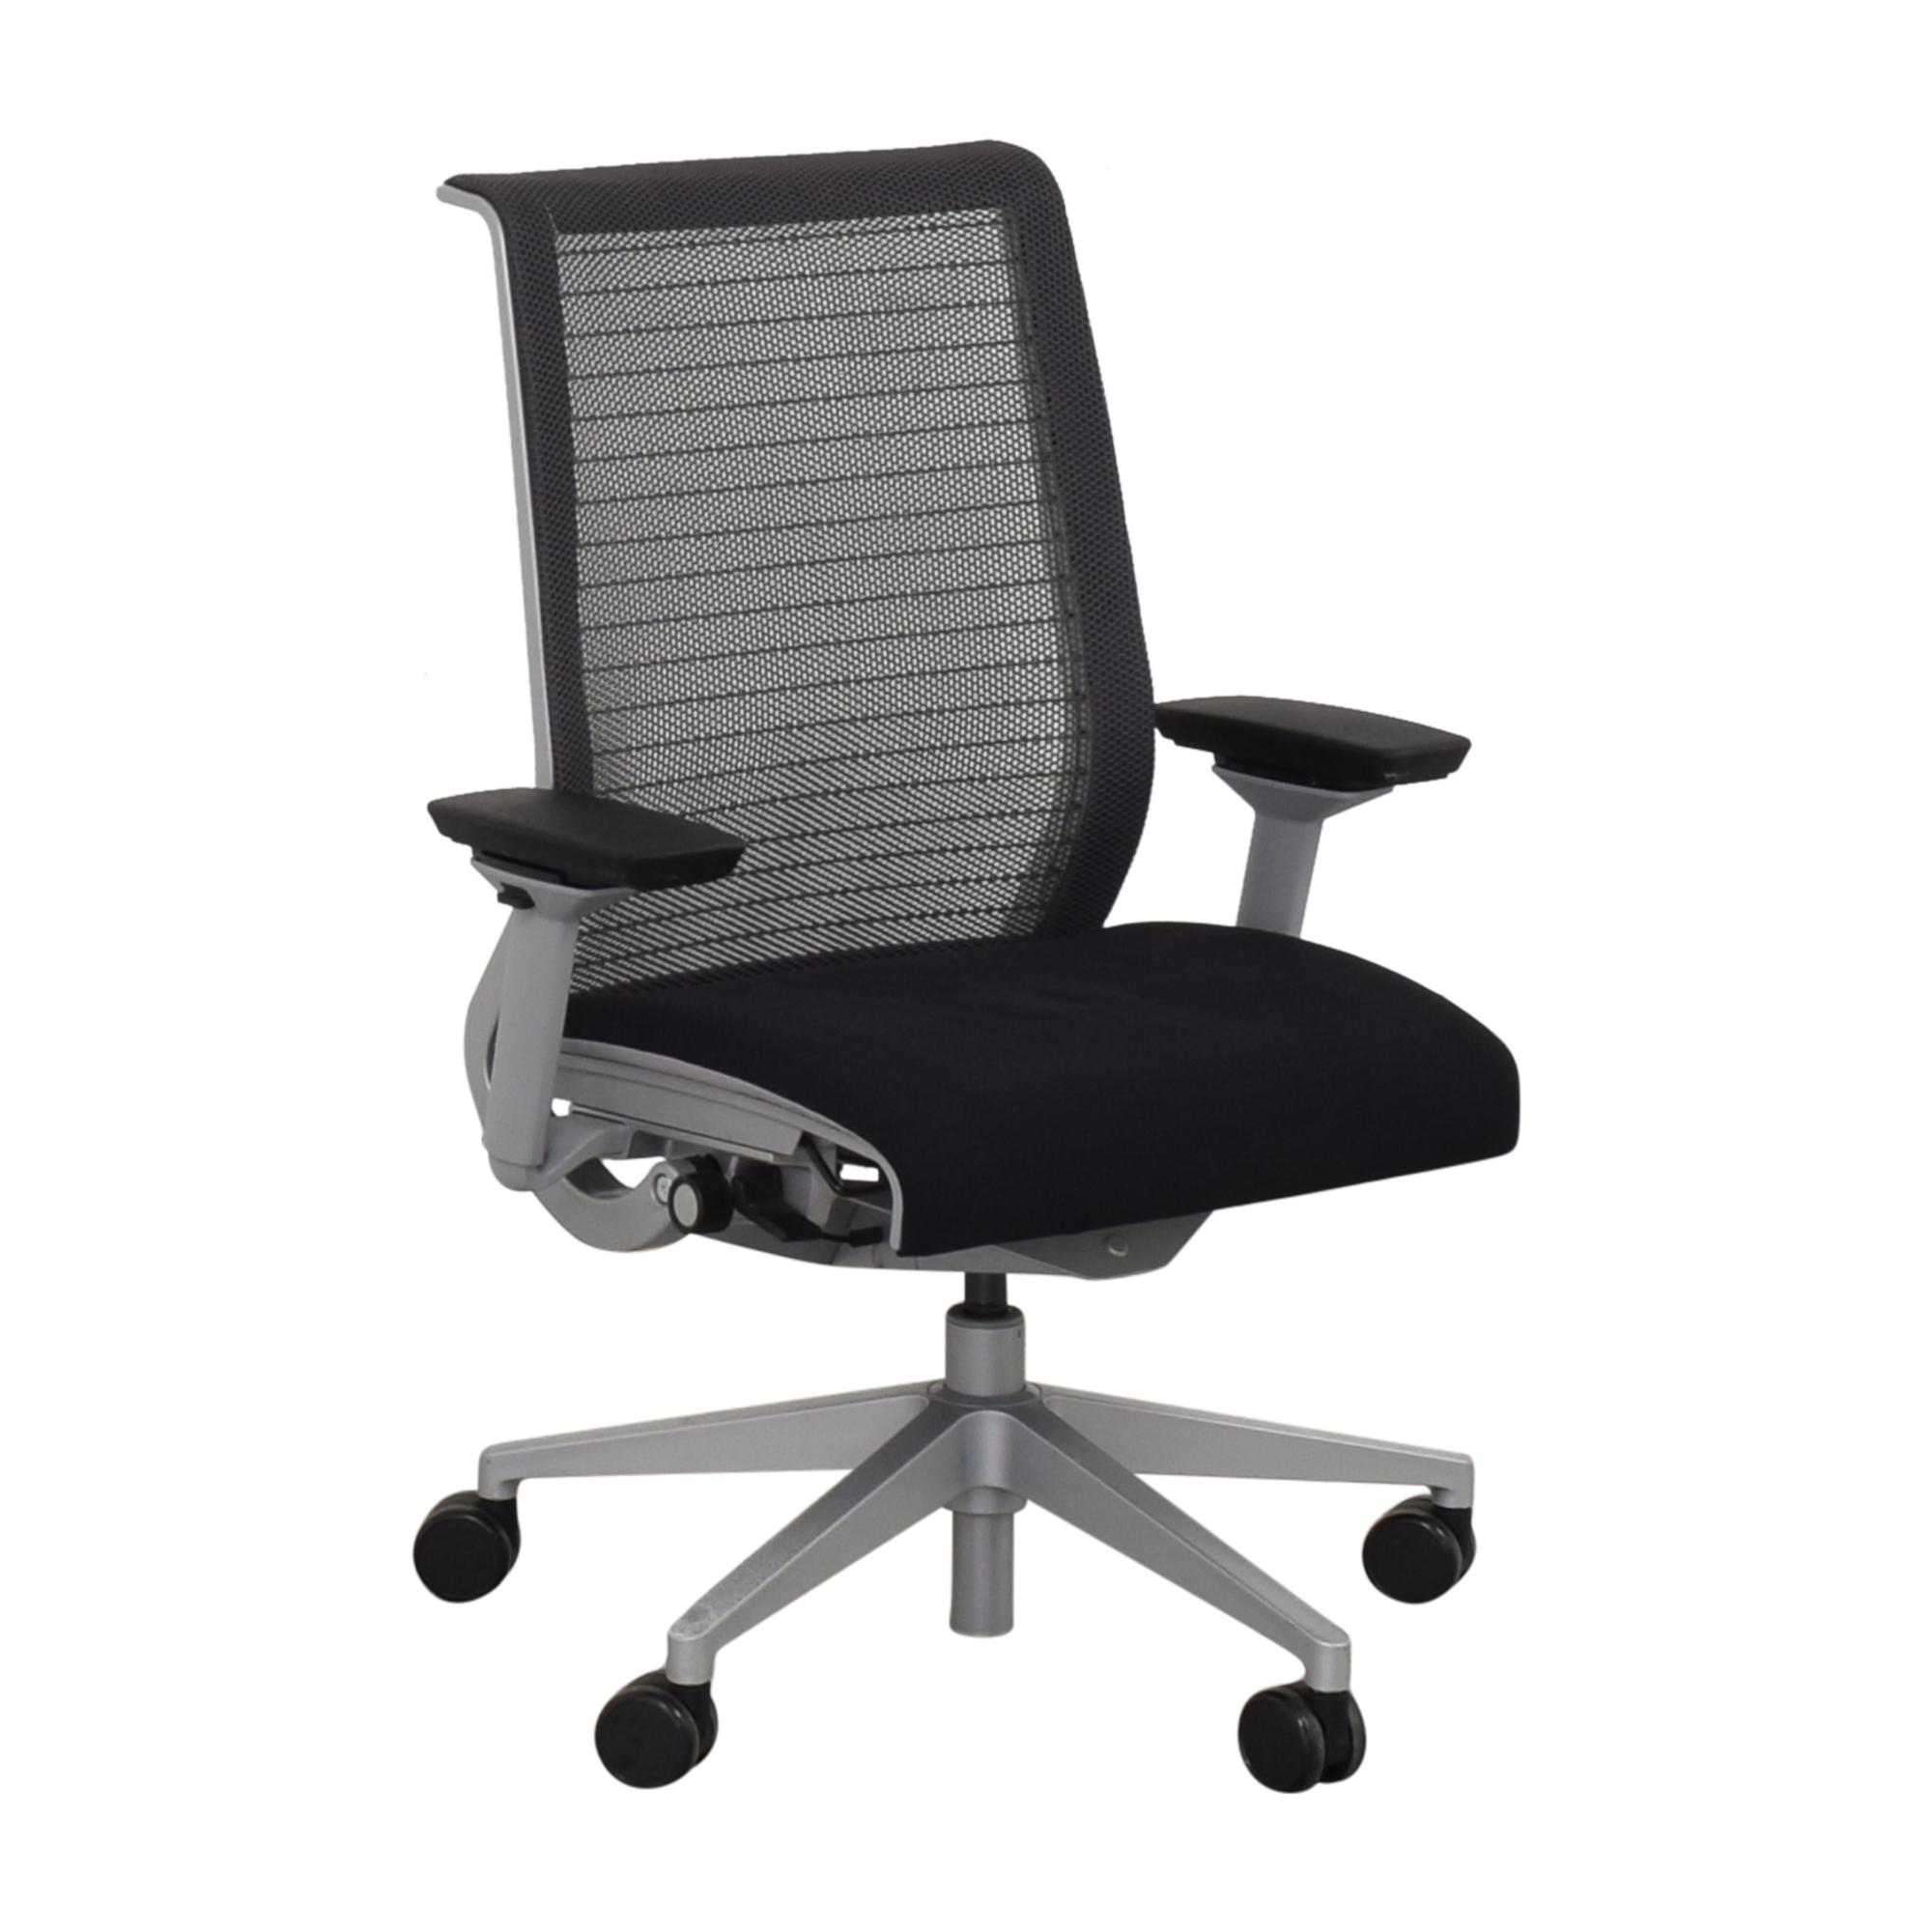 Steelcase Steelcase Cobi Swivel Chair second hand